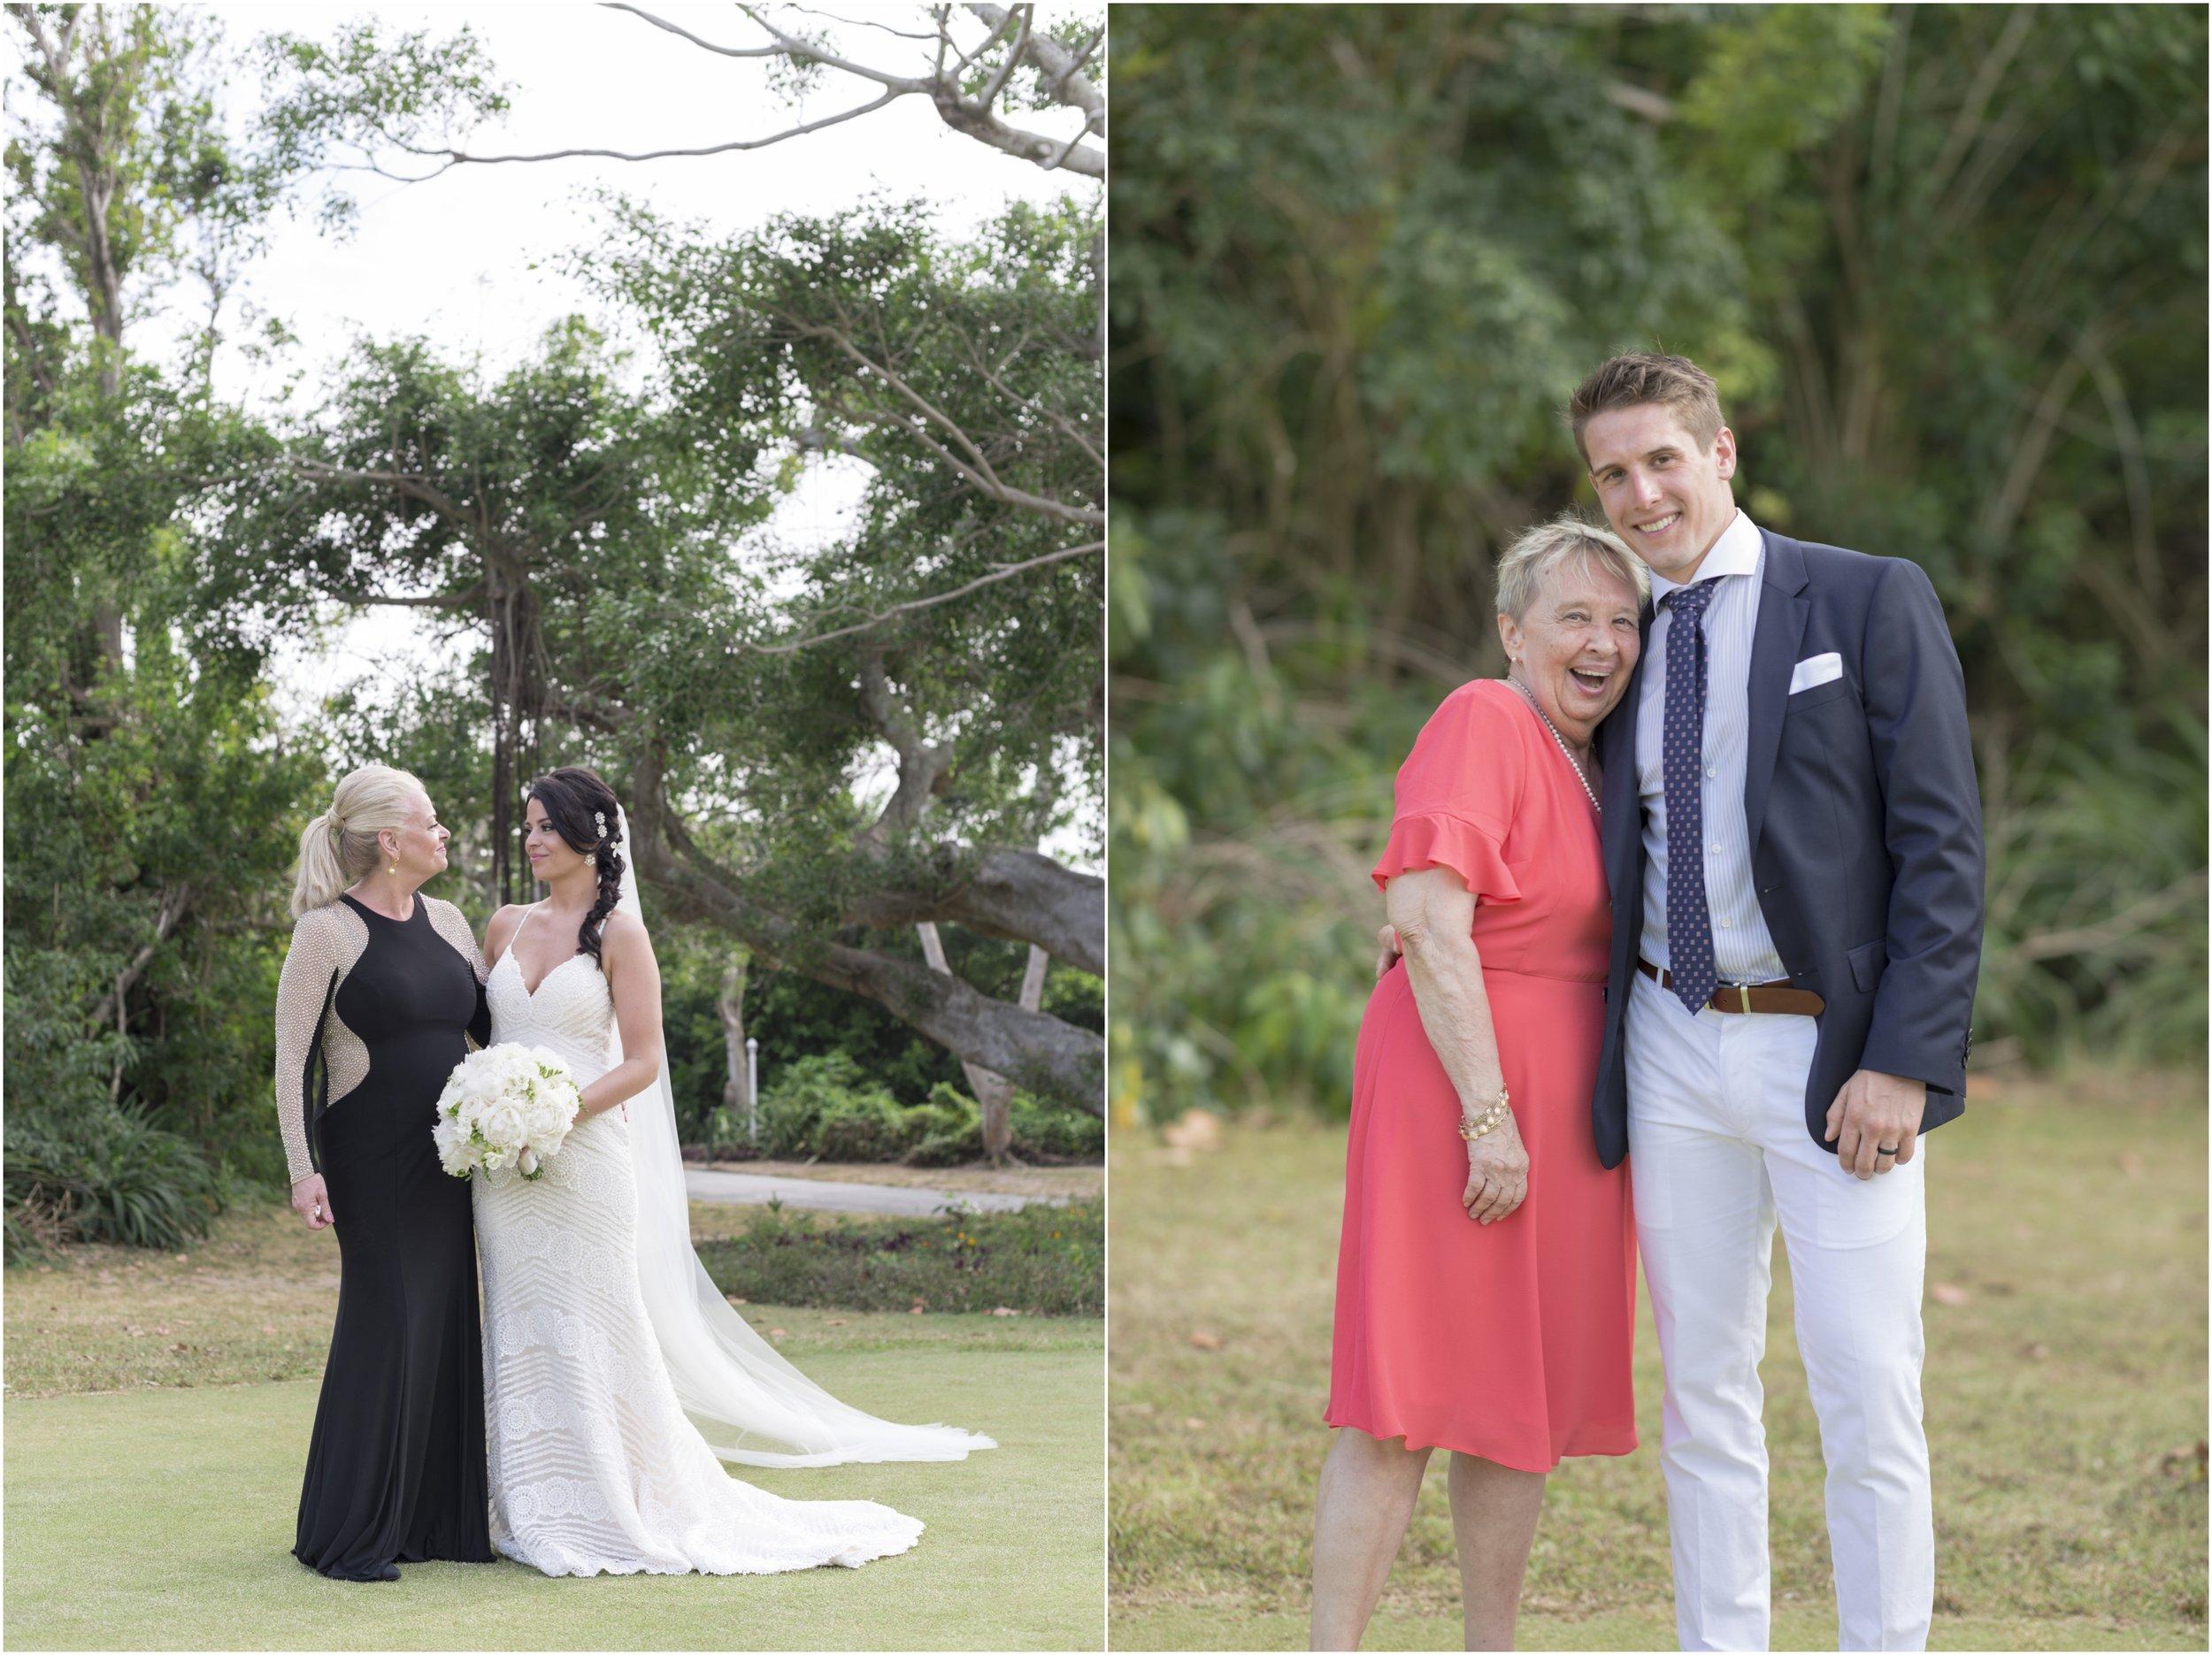 ©FianderFoto_Alyse_Stevie_Wedding_Bermuda_31.jpg